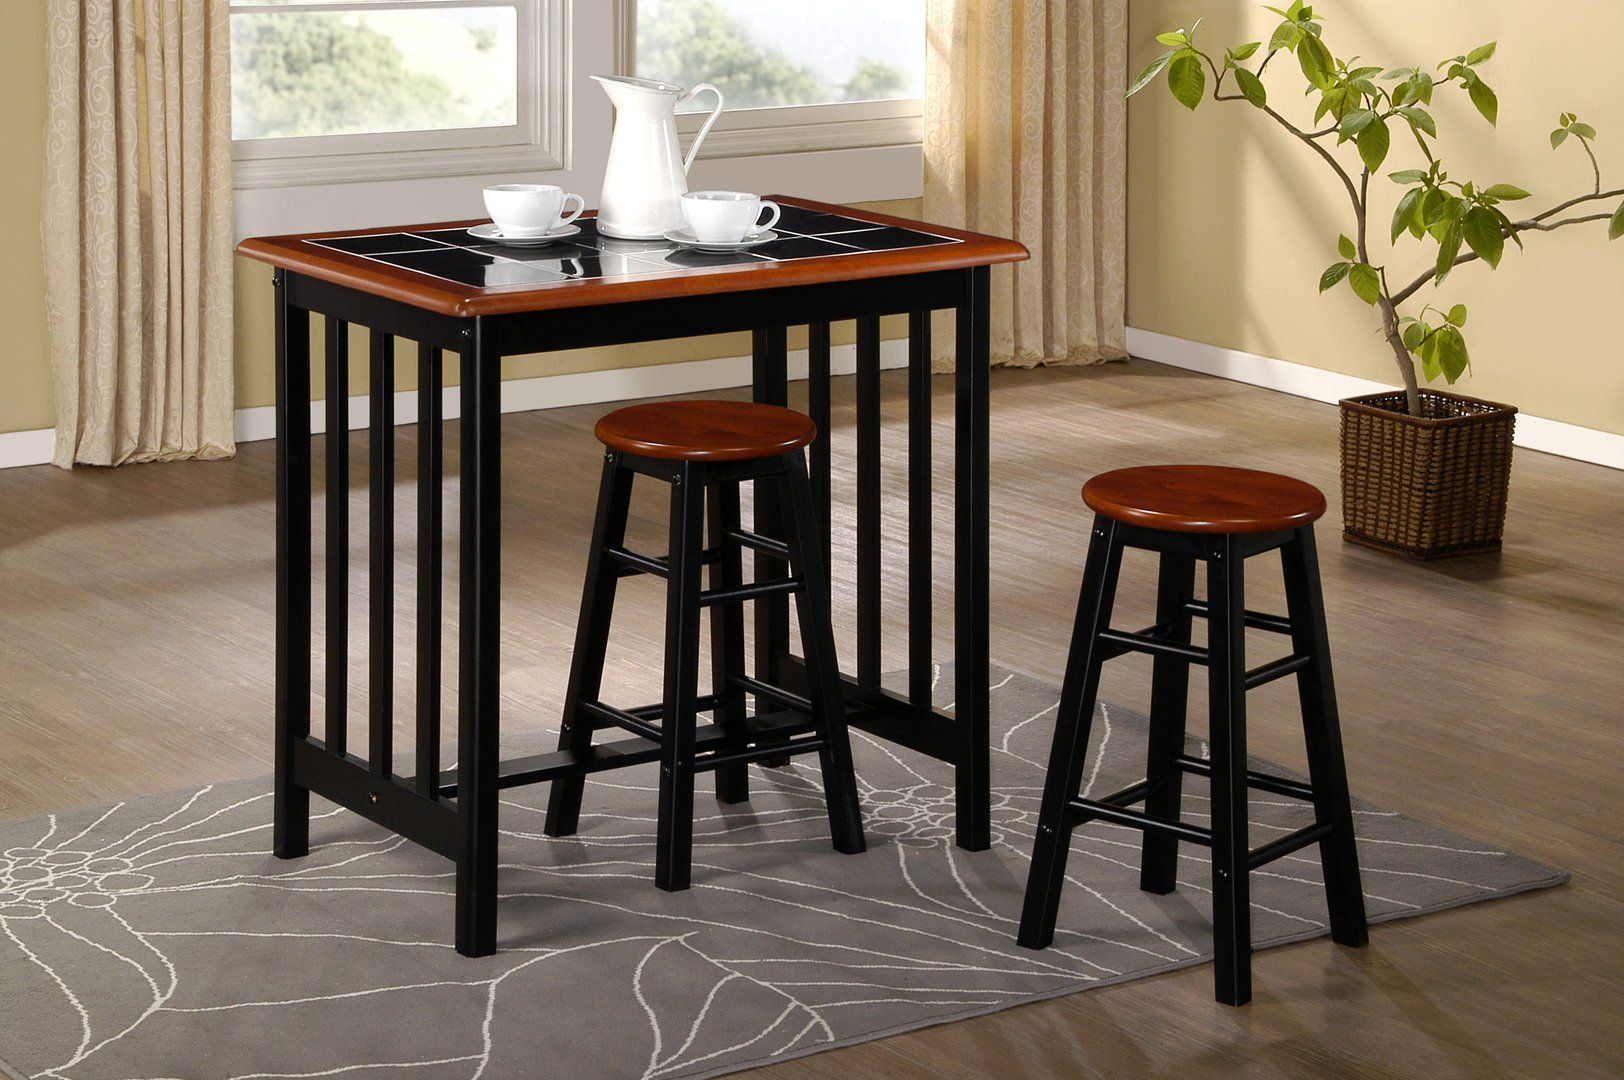 Linon Space Saver Piece Kitchen Table Set Home